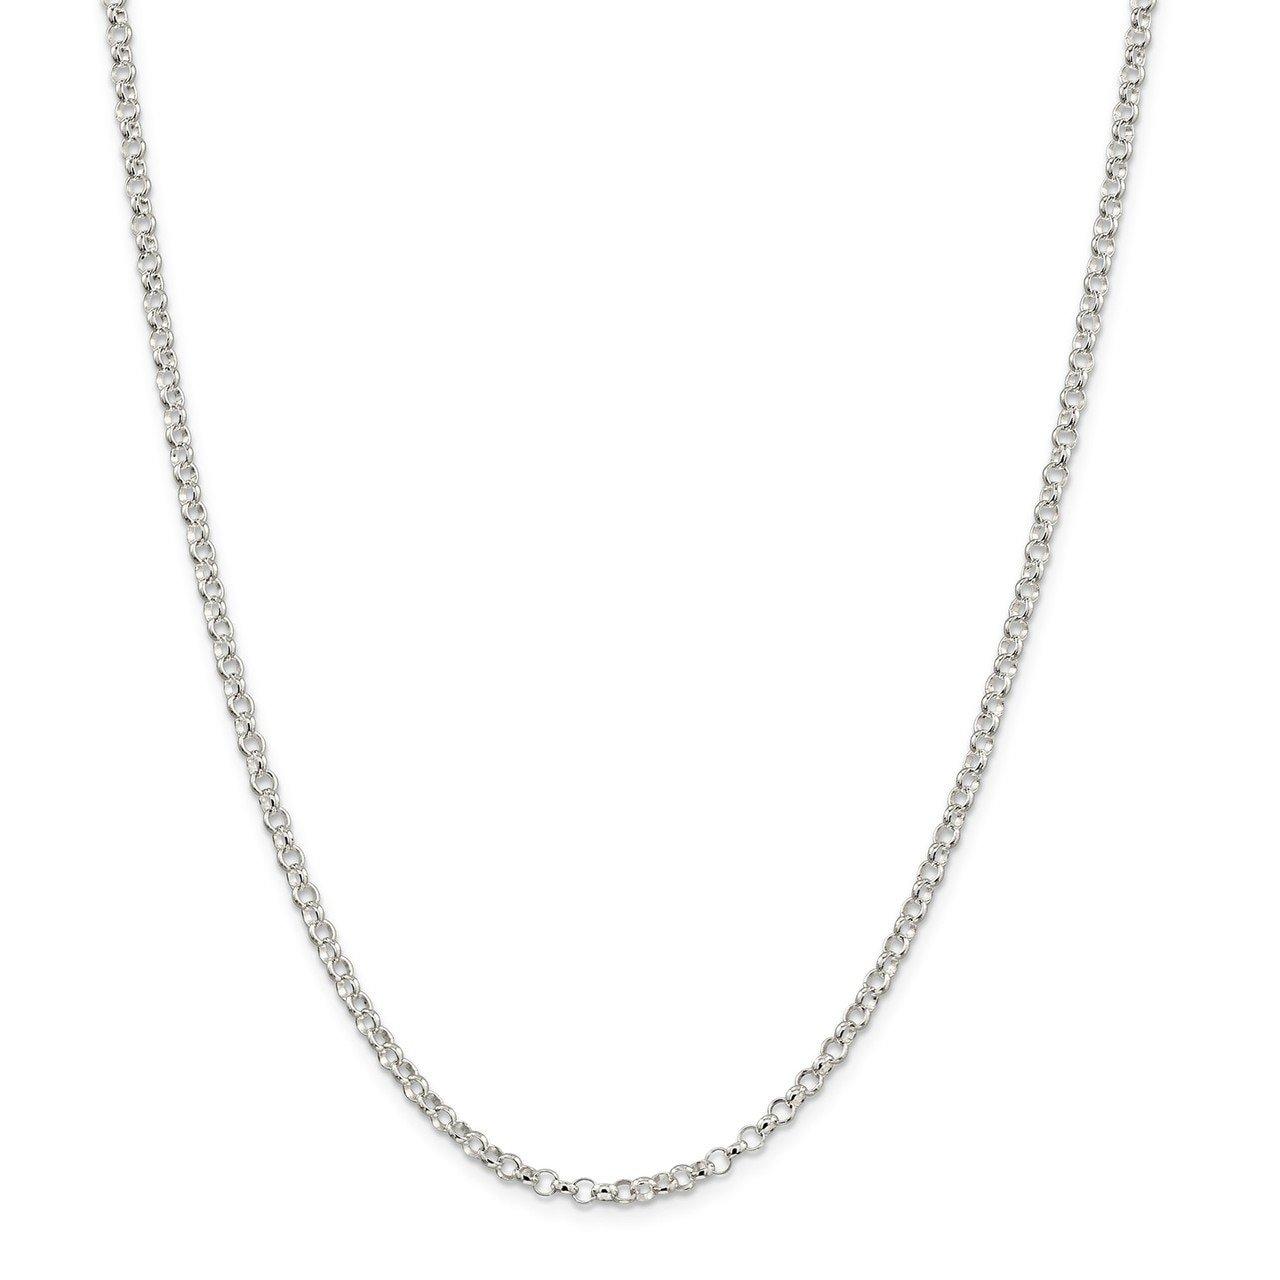 Lex /& Lu Sterling Silver 3.0mm Belcher Light Chain Necklace or Bracelet